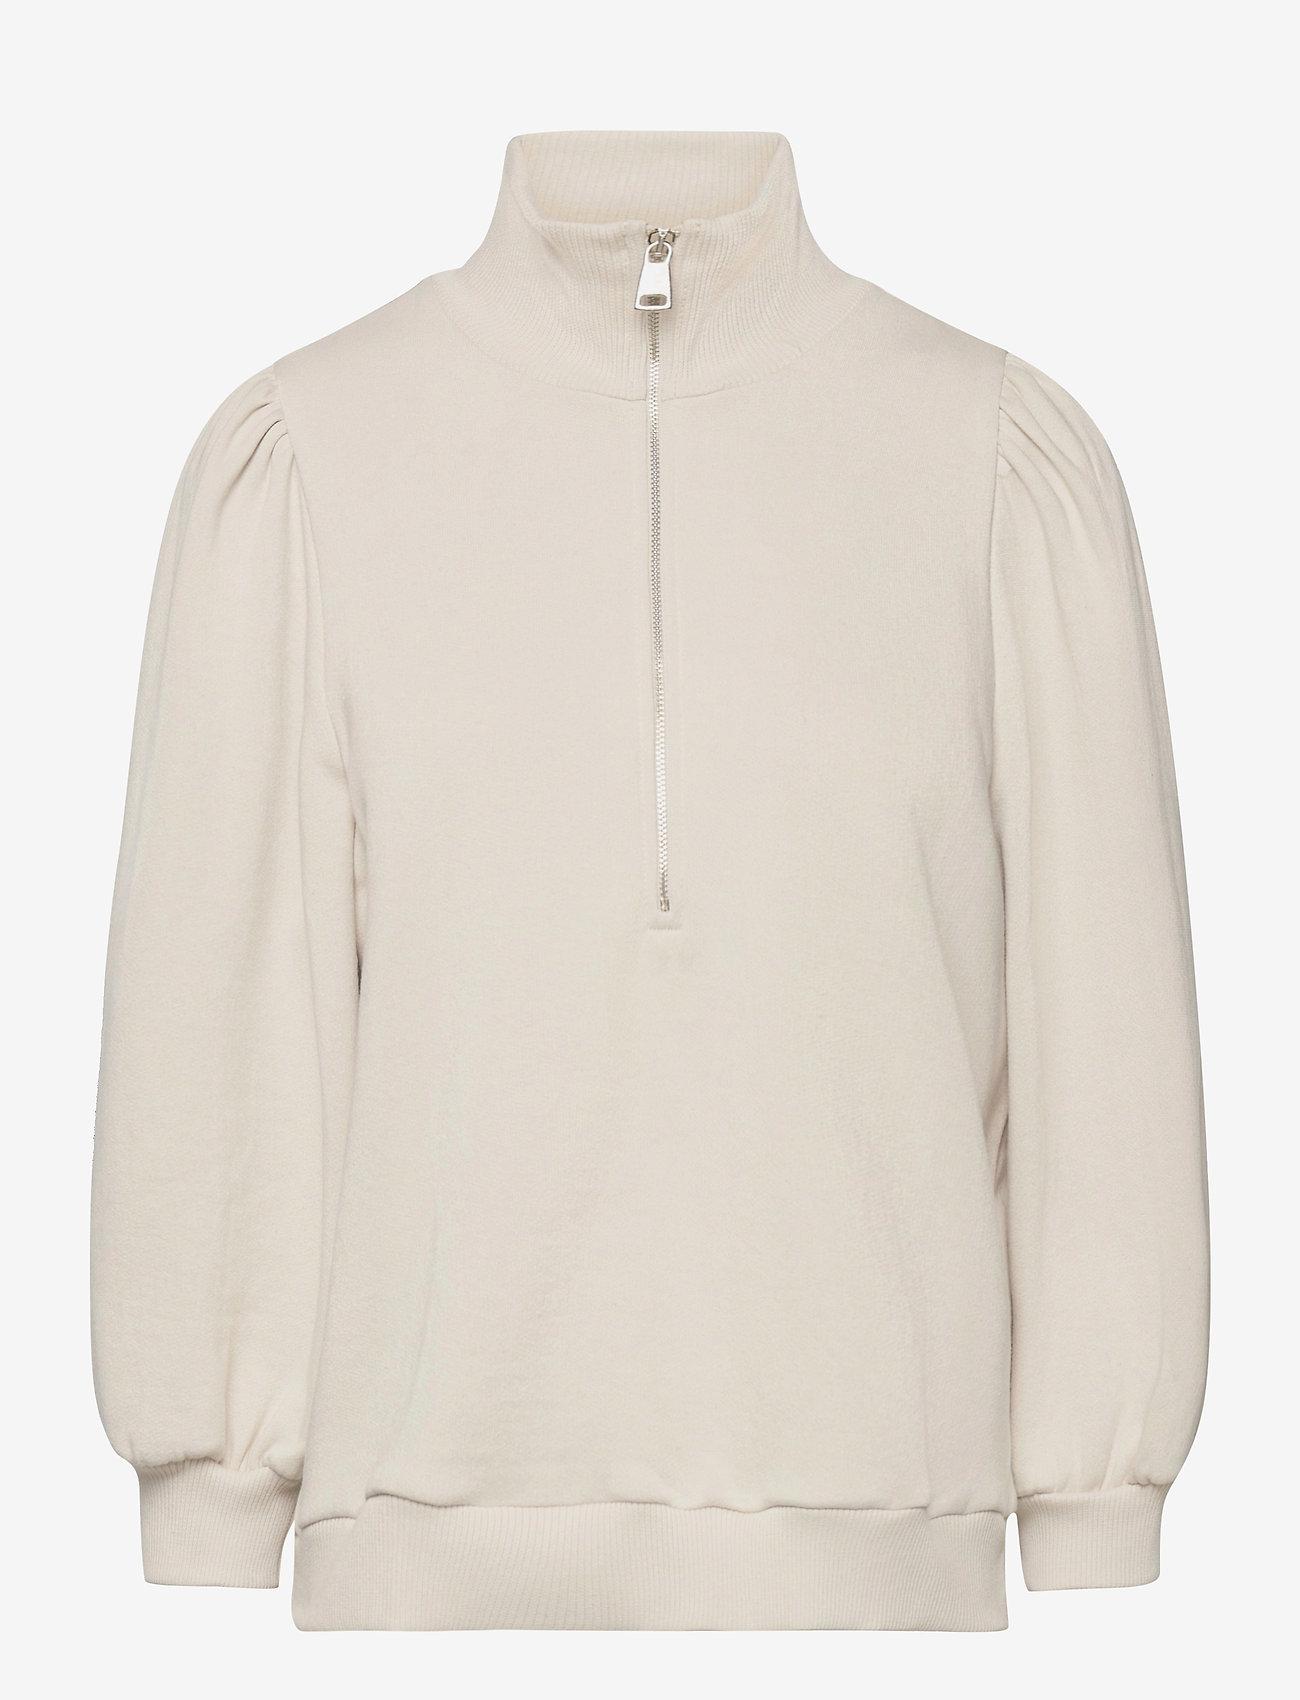 Gestuz - NankitaGZ ss zipper sweatshirt - sweatshirts & hoodies - moonbeam - 1